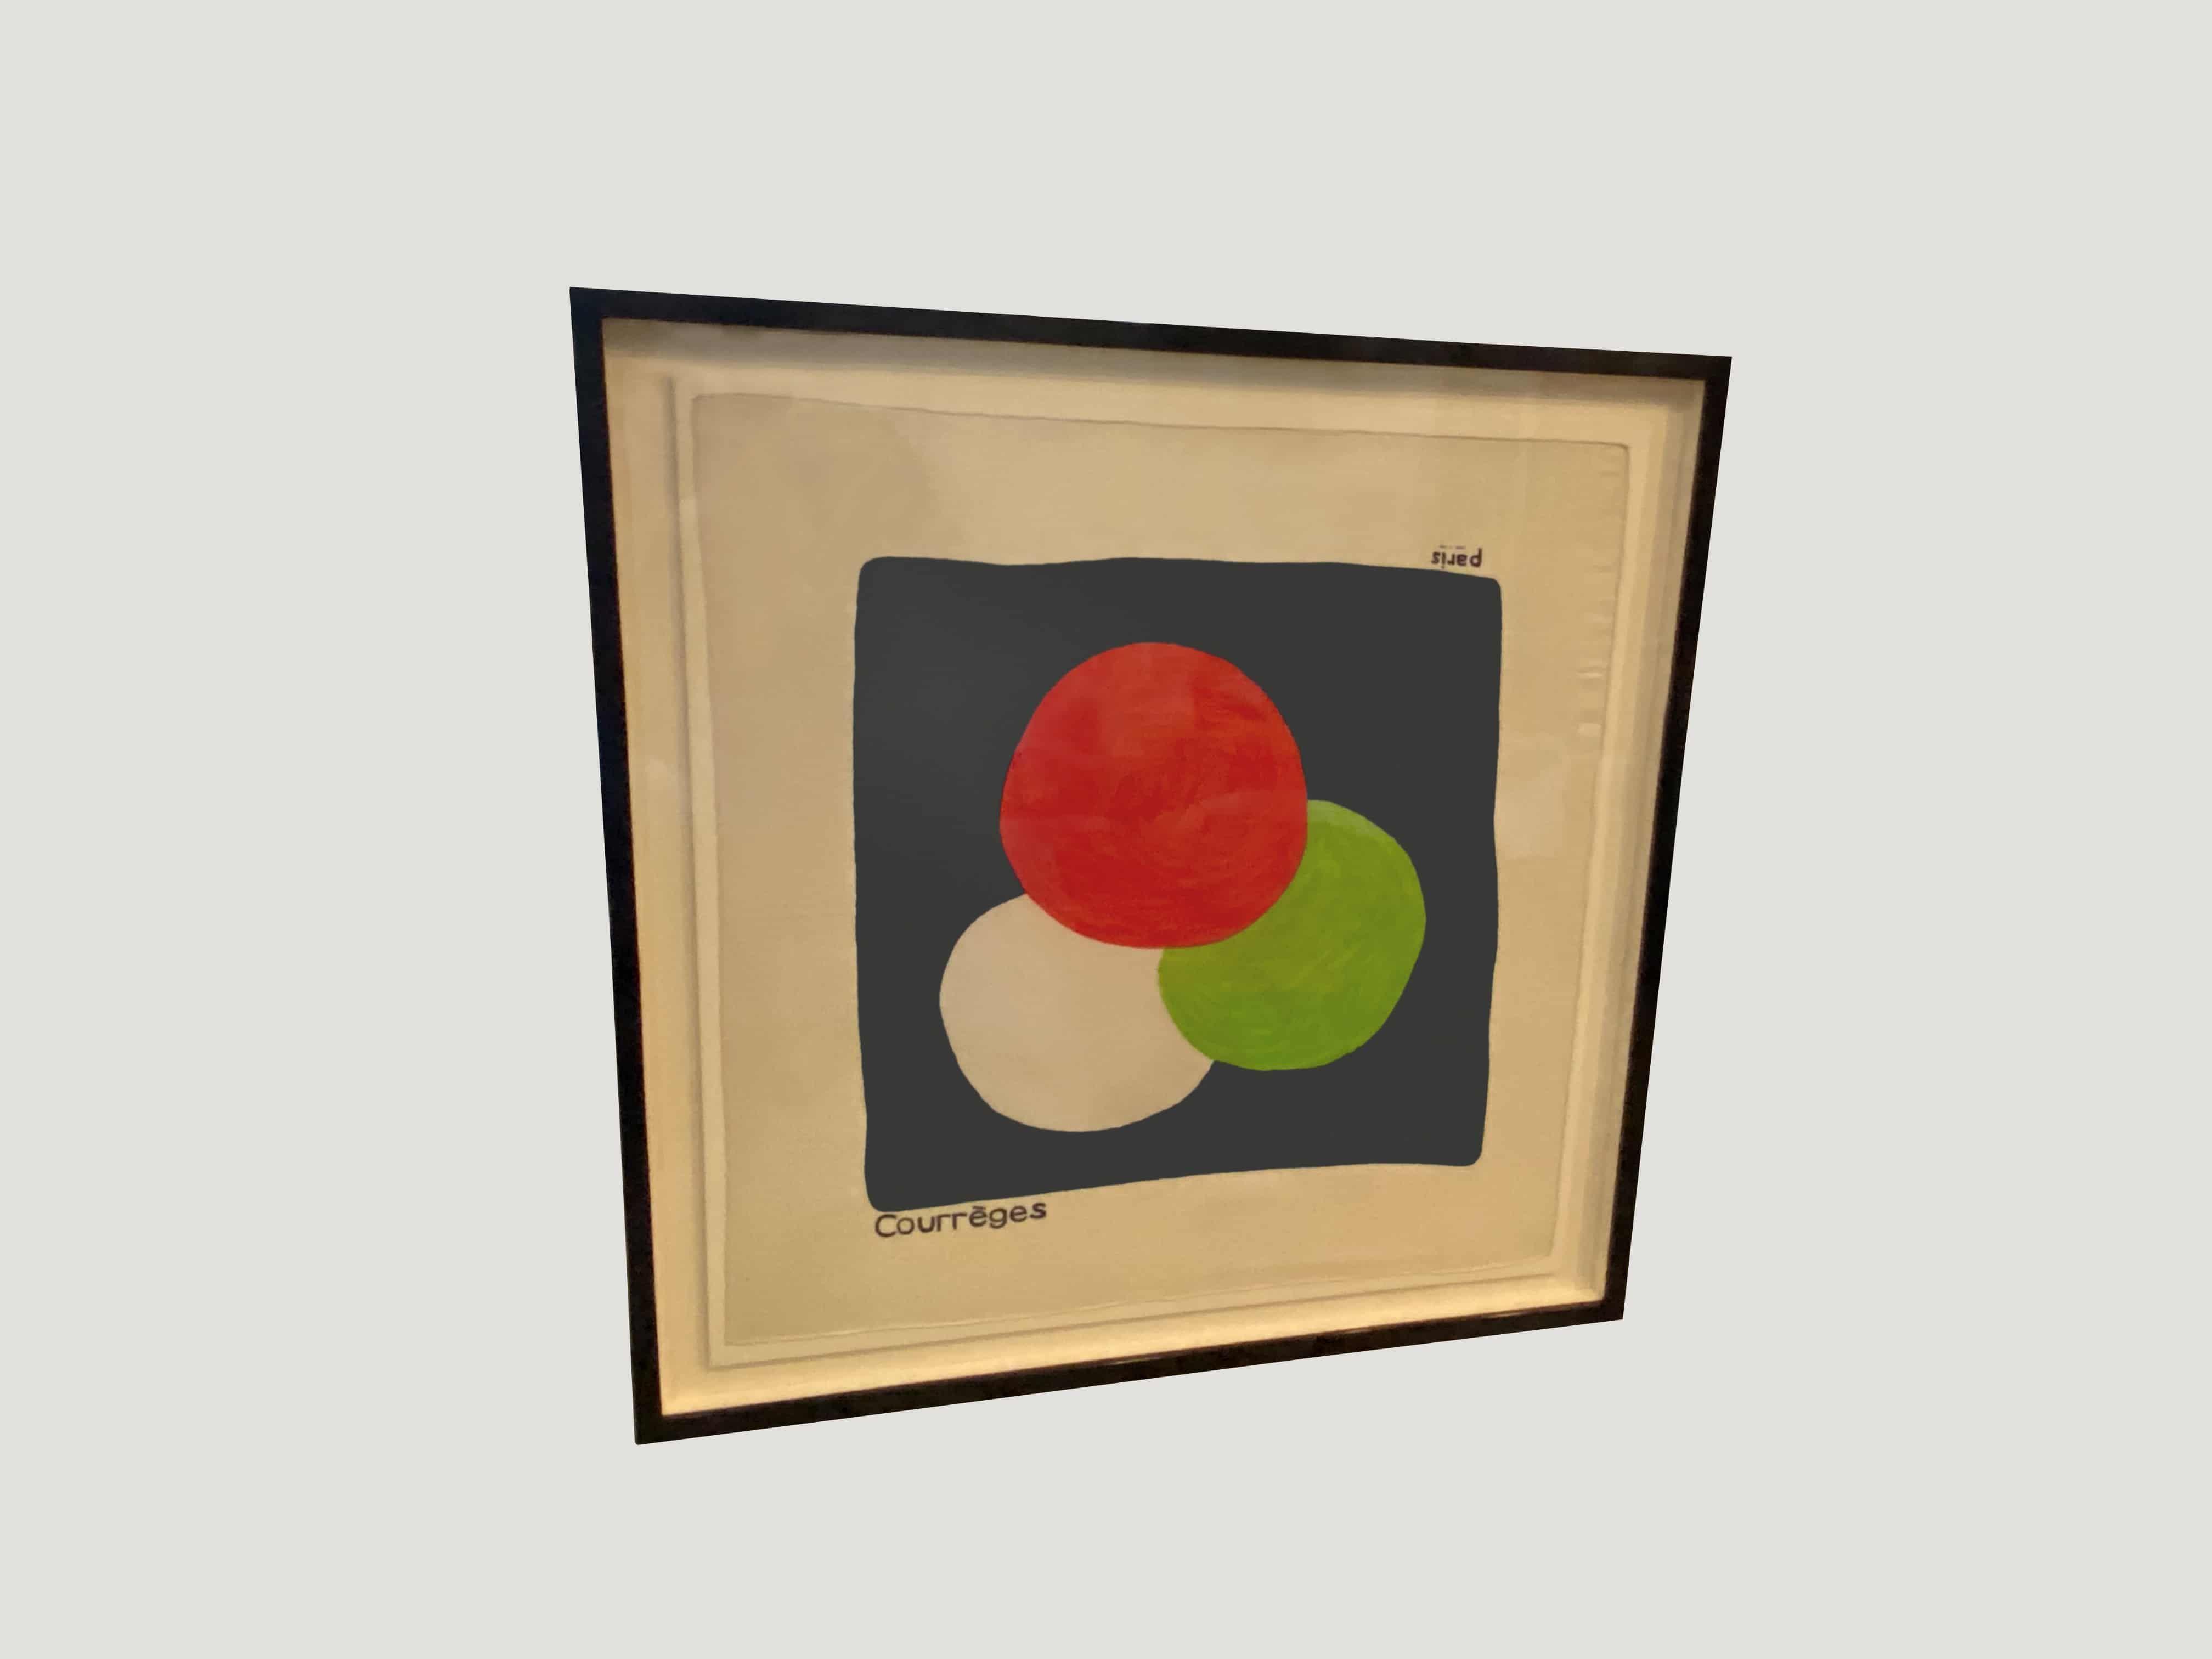 Pin on Art Objects